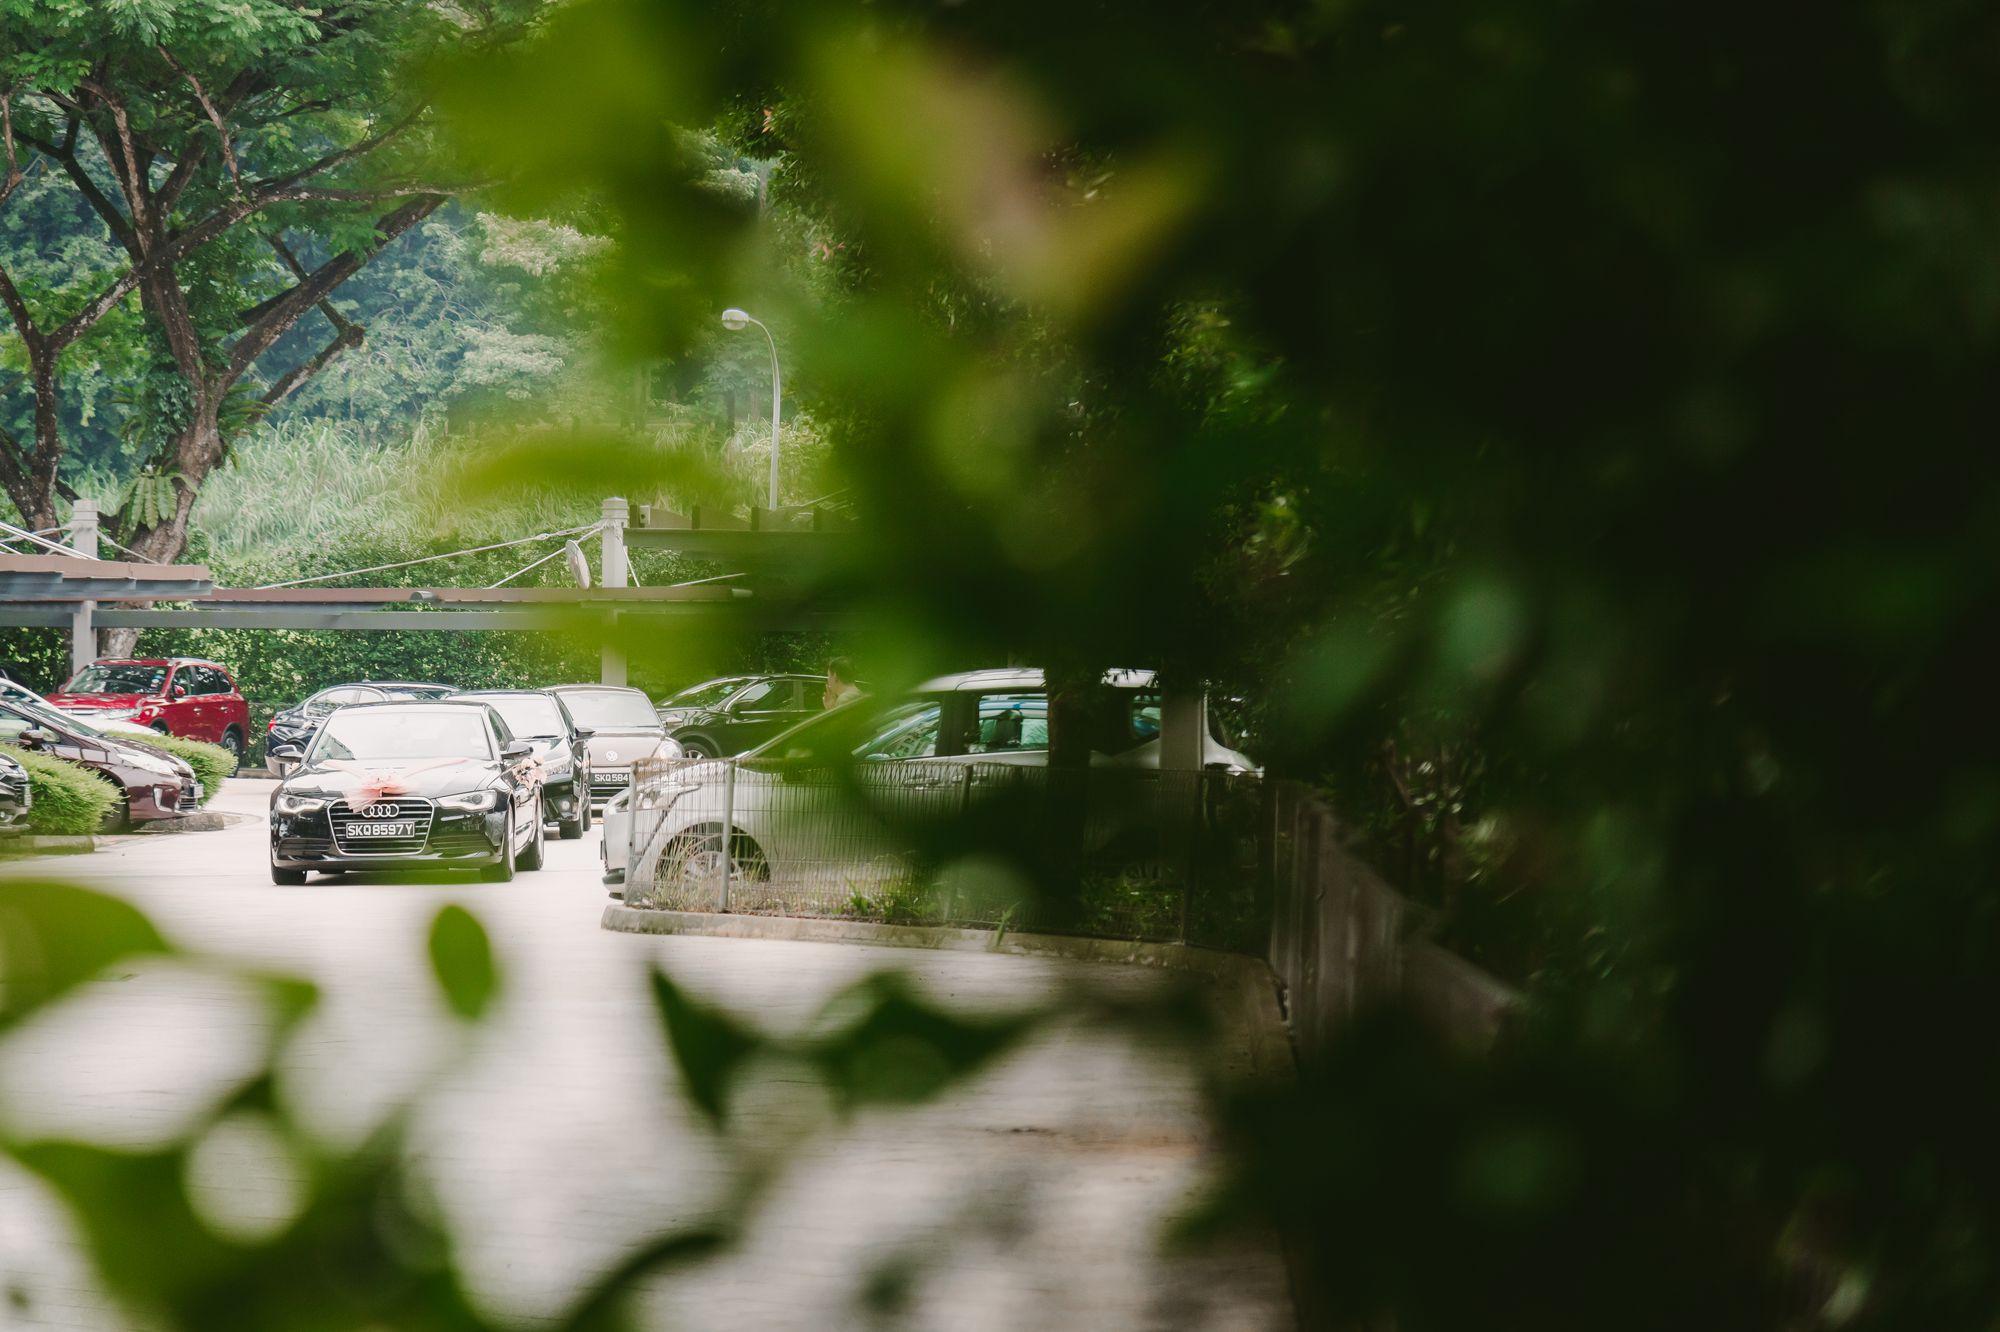 fullerton_singapore_photography_ 6.jpg